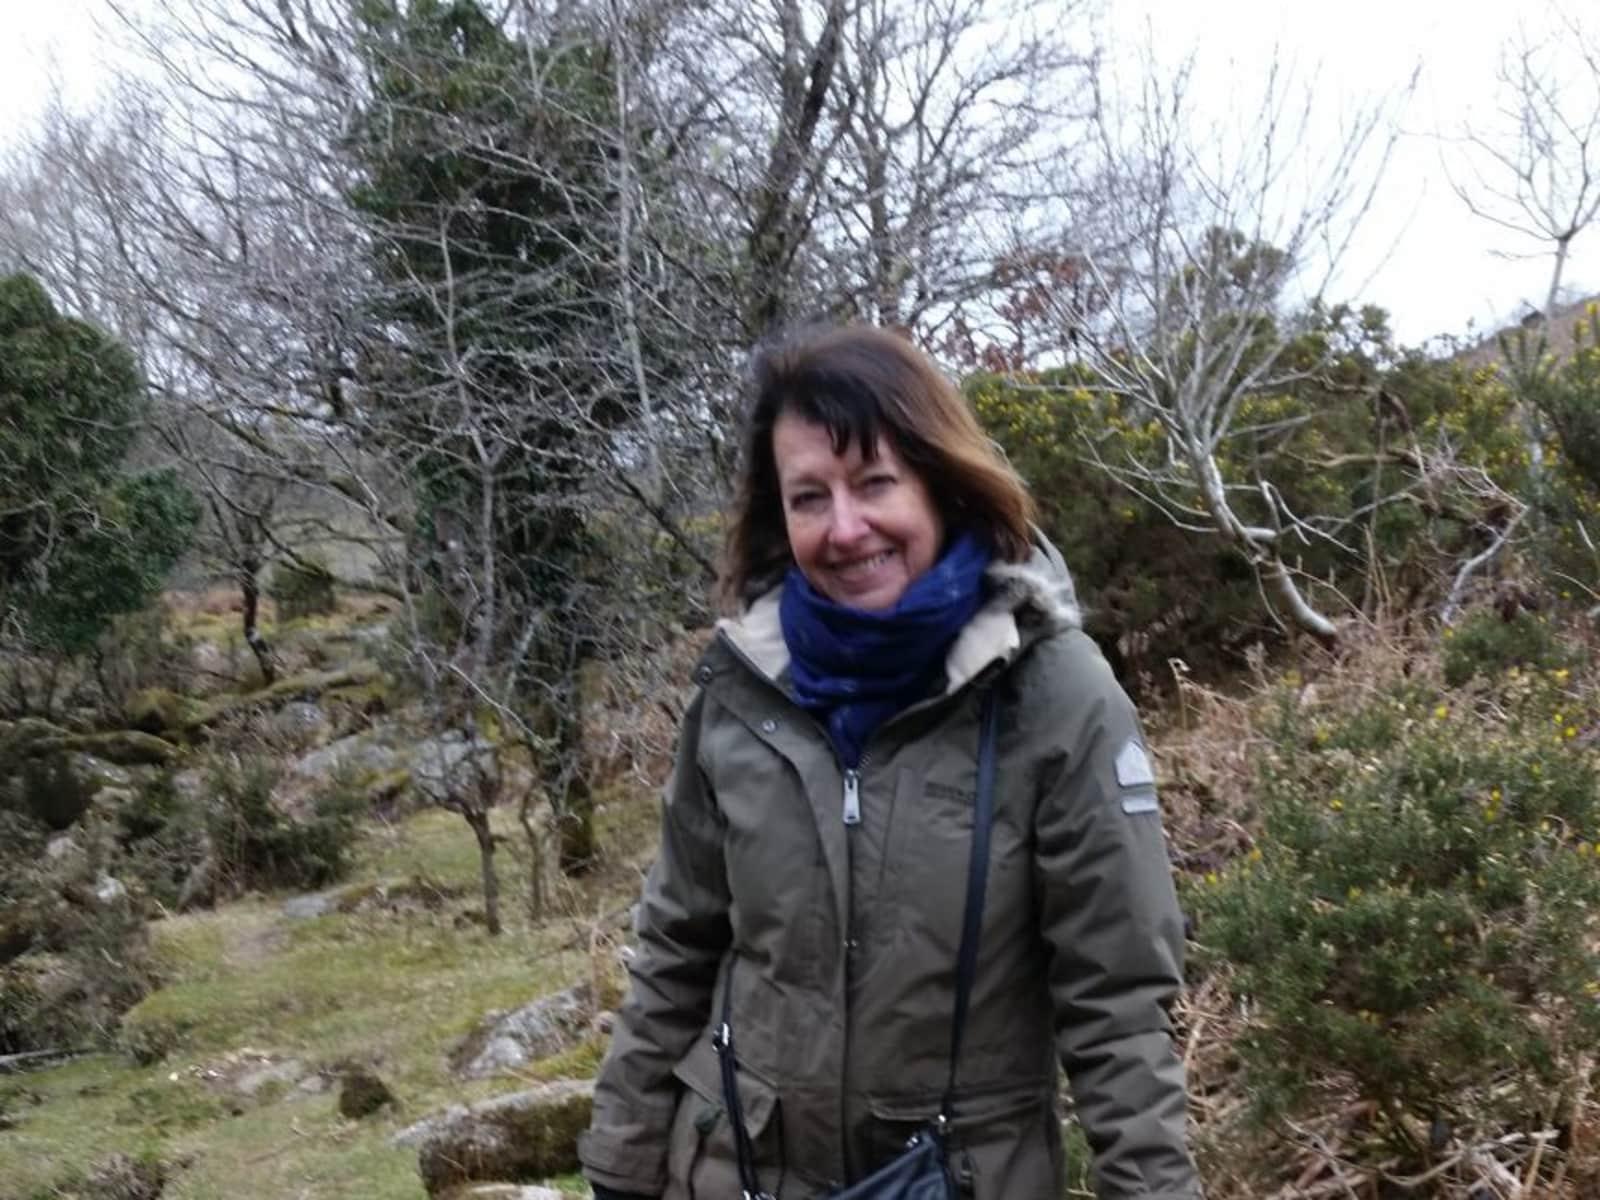 Jan from Penzance, United Kingdom